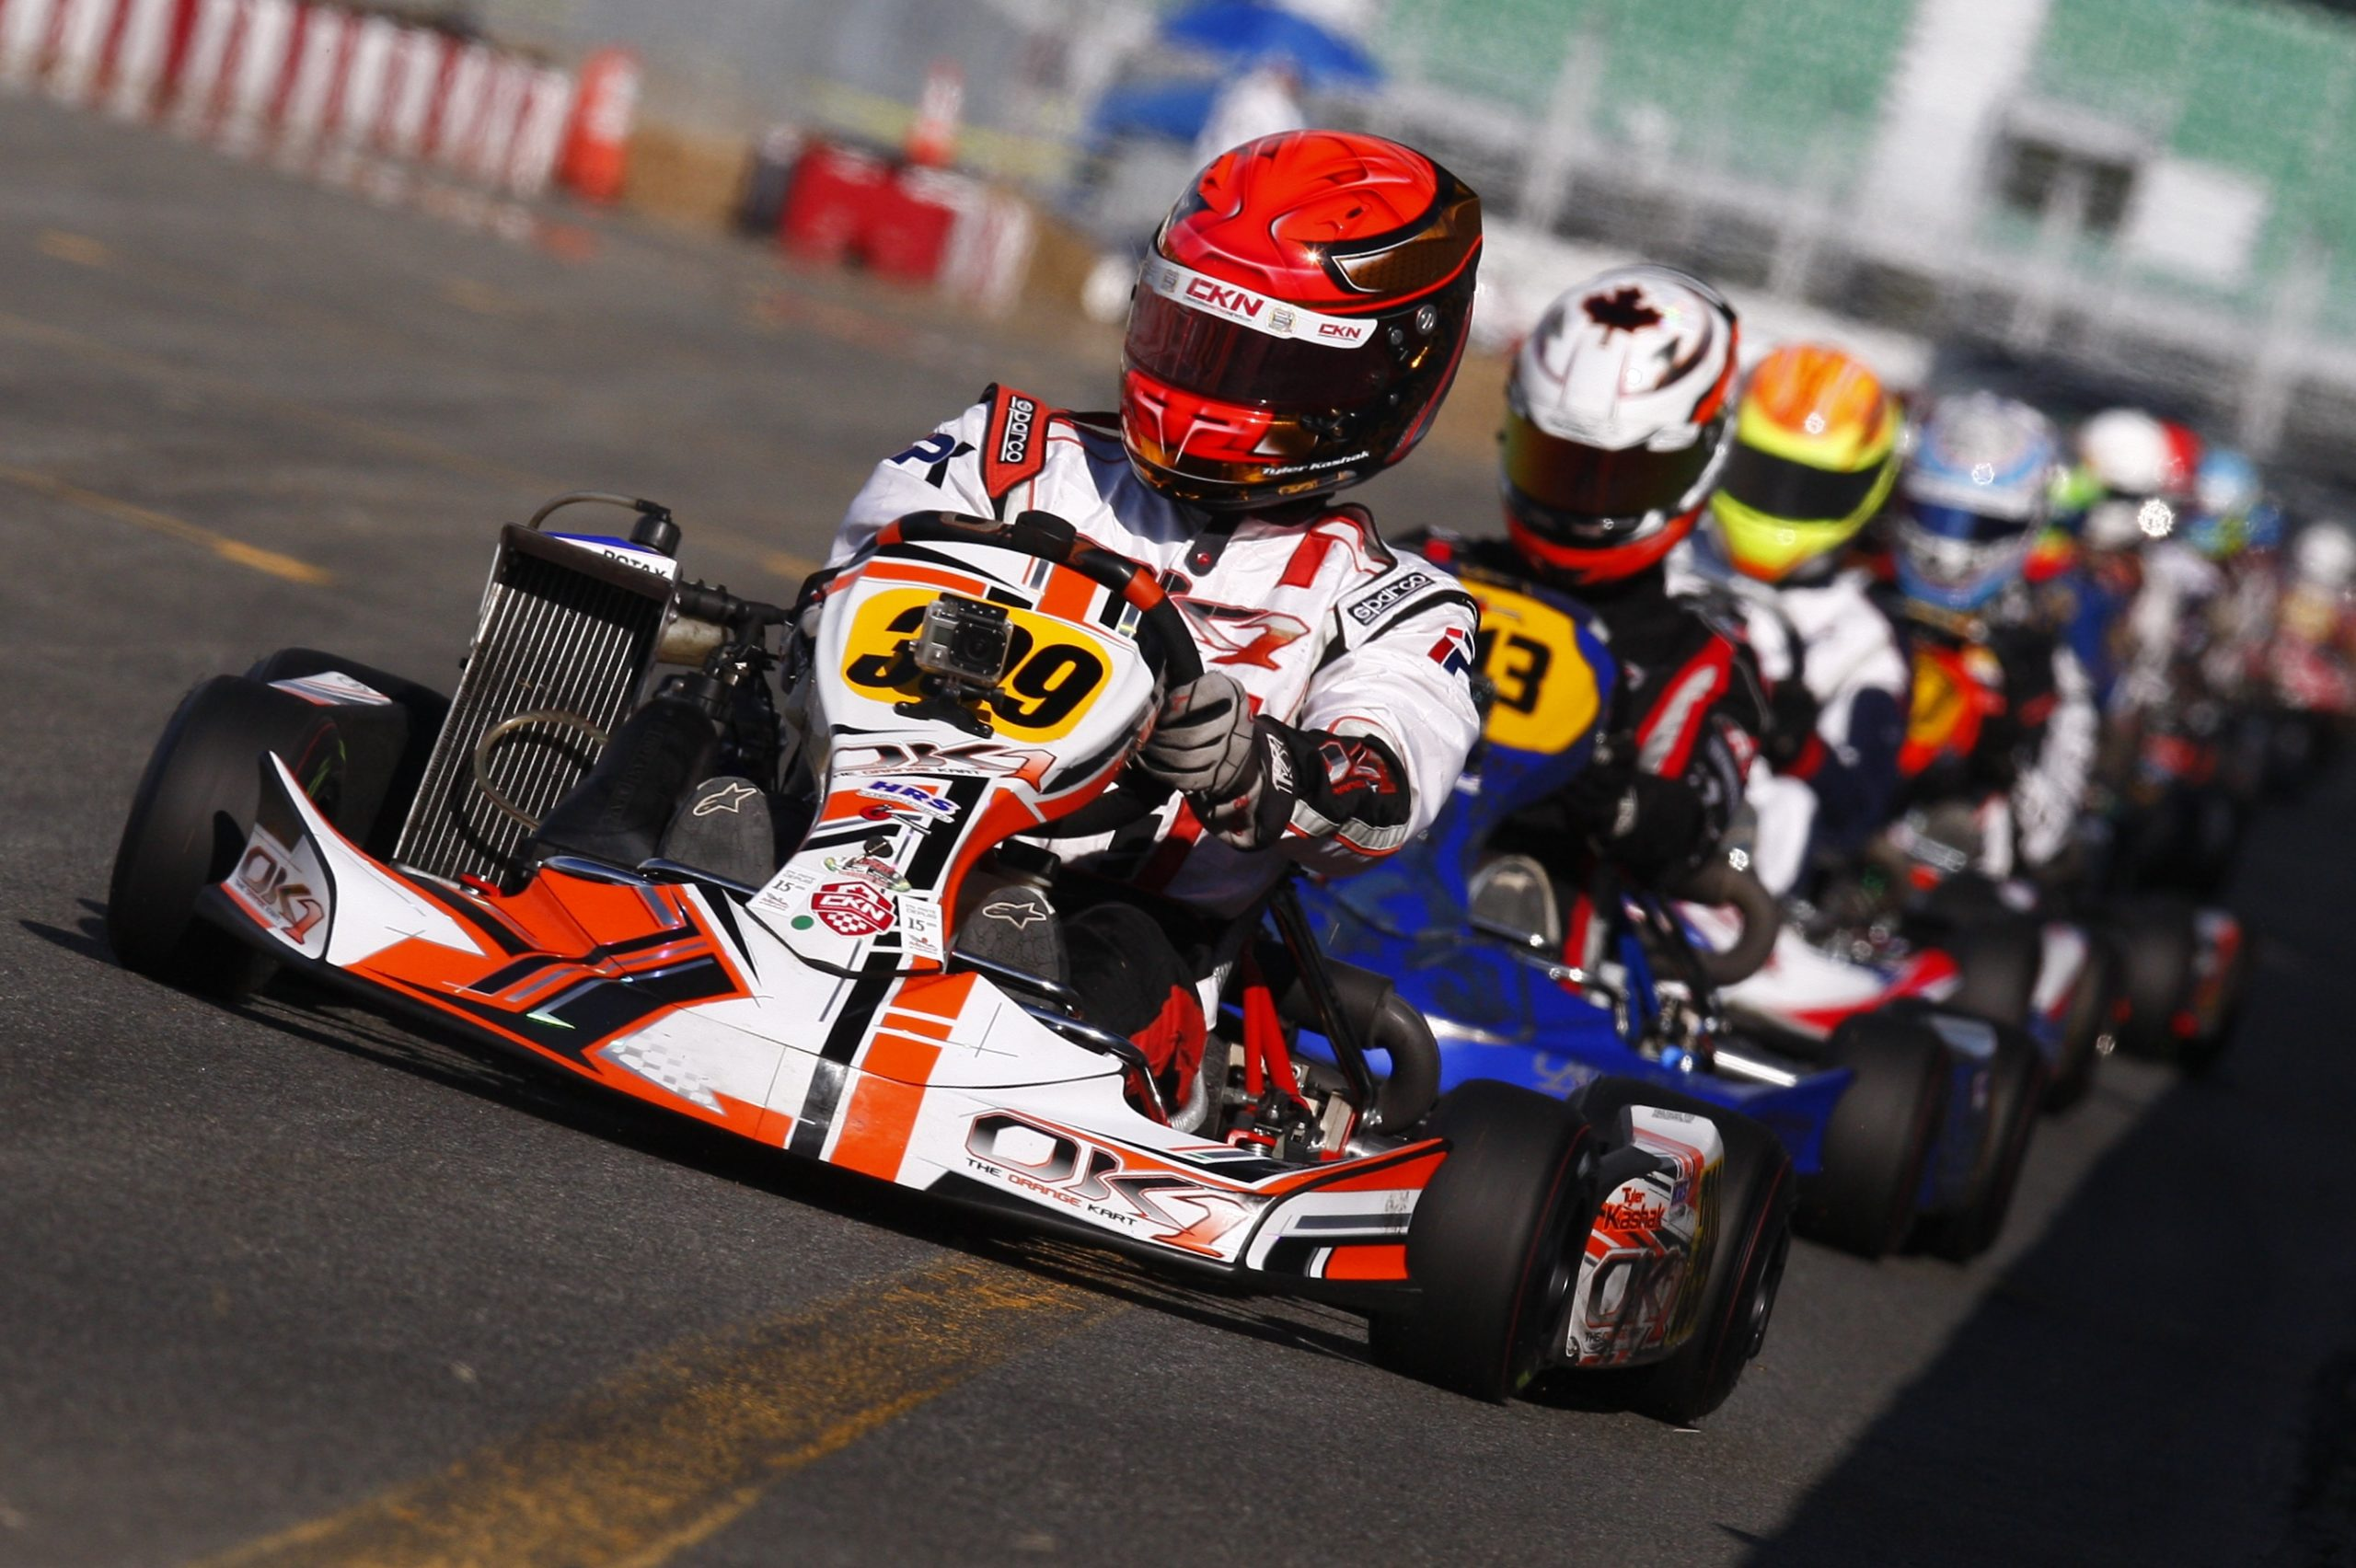 Race Report: IPK North America at ECKC Round 3